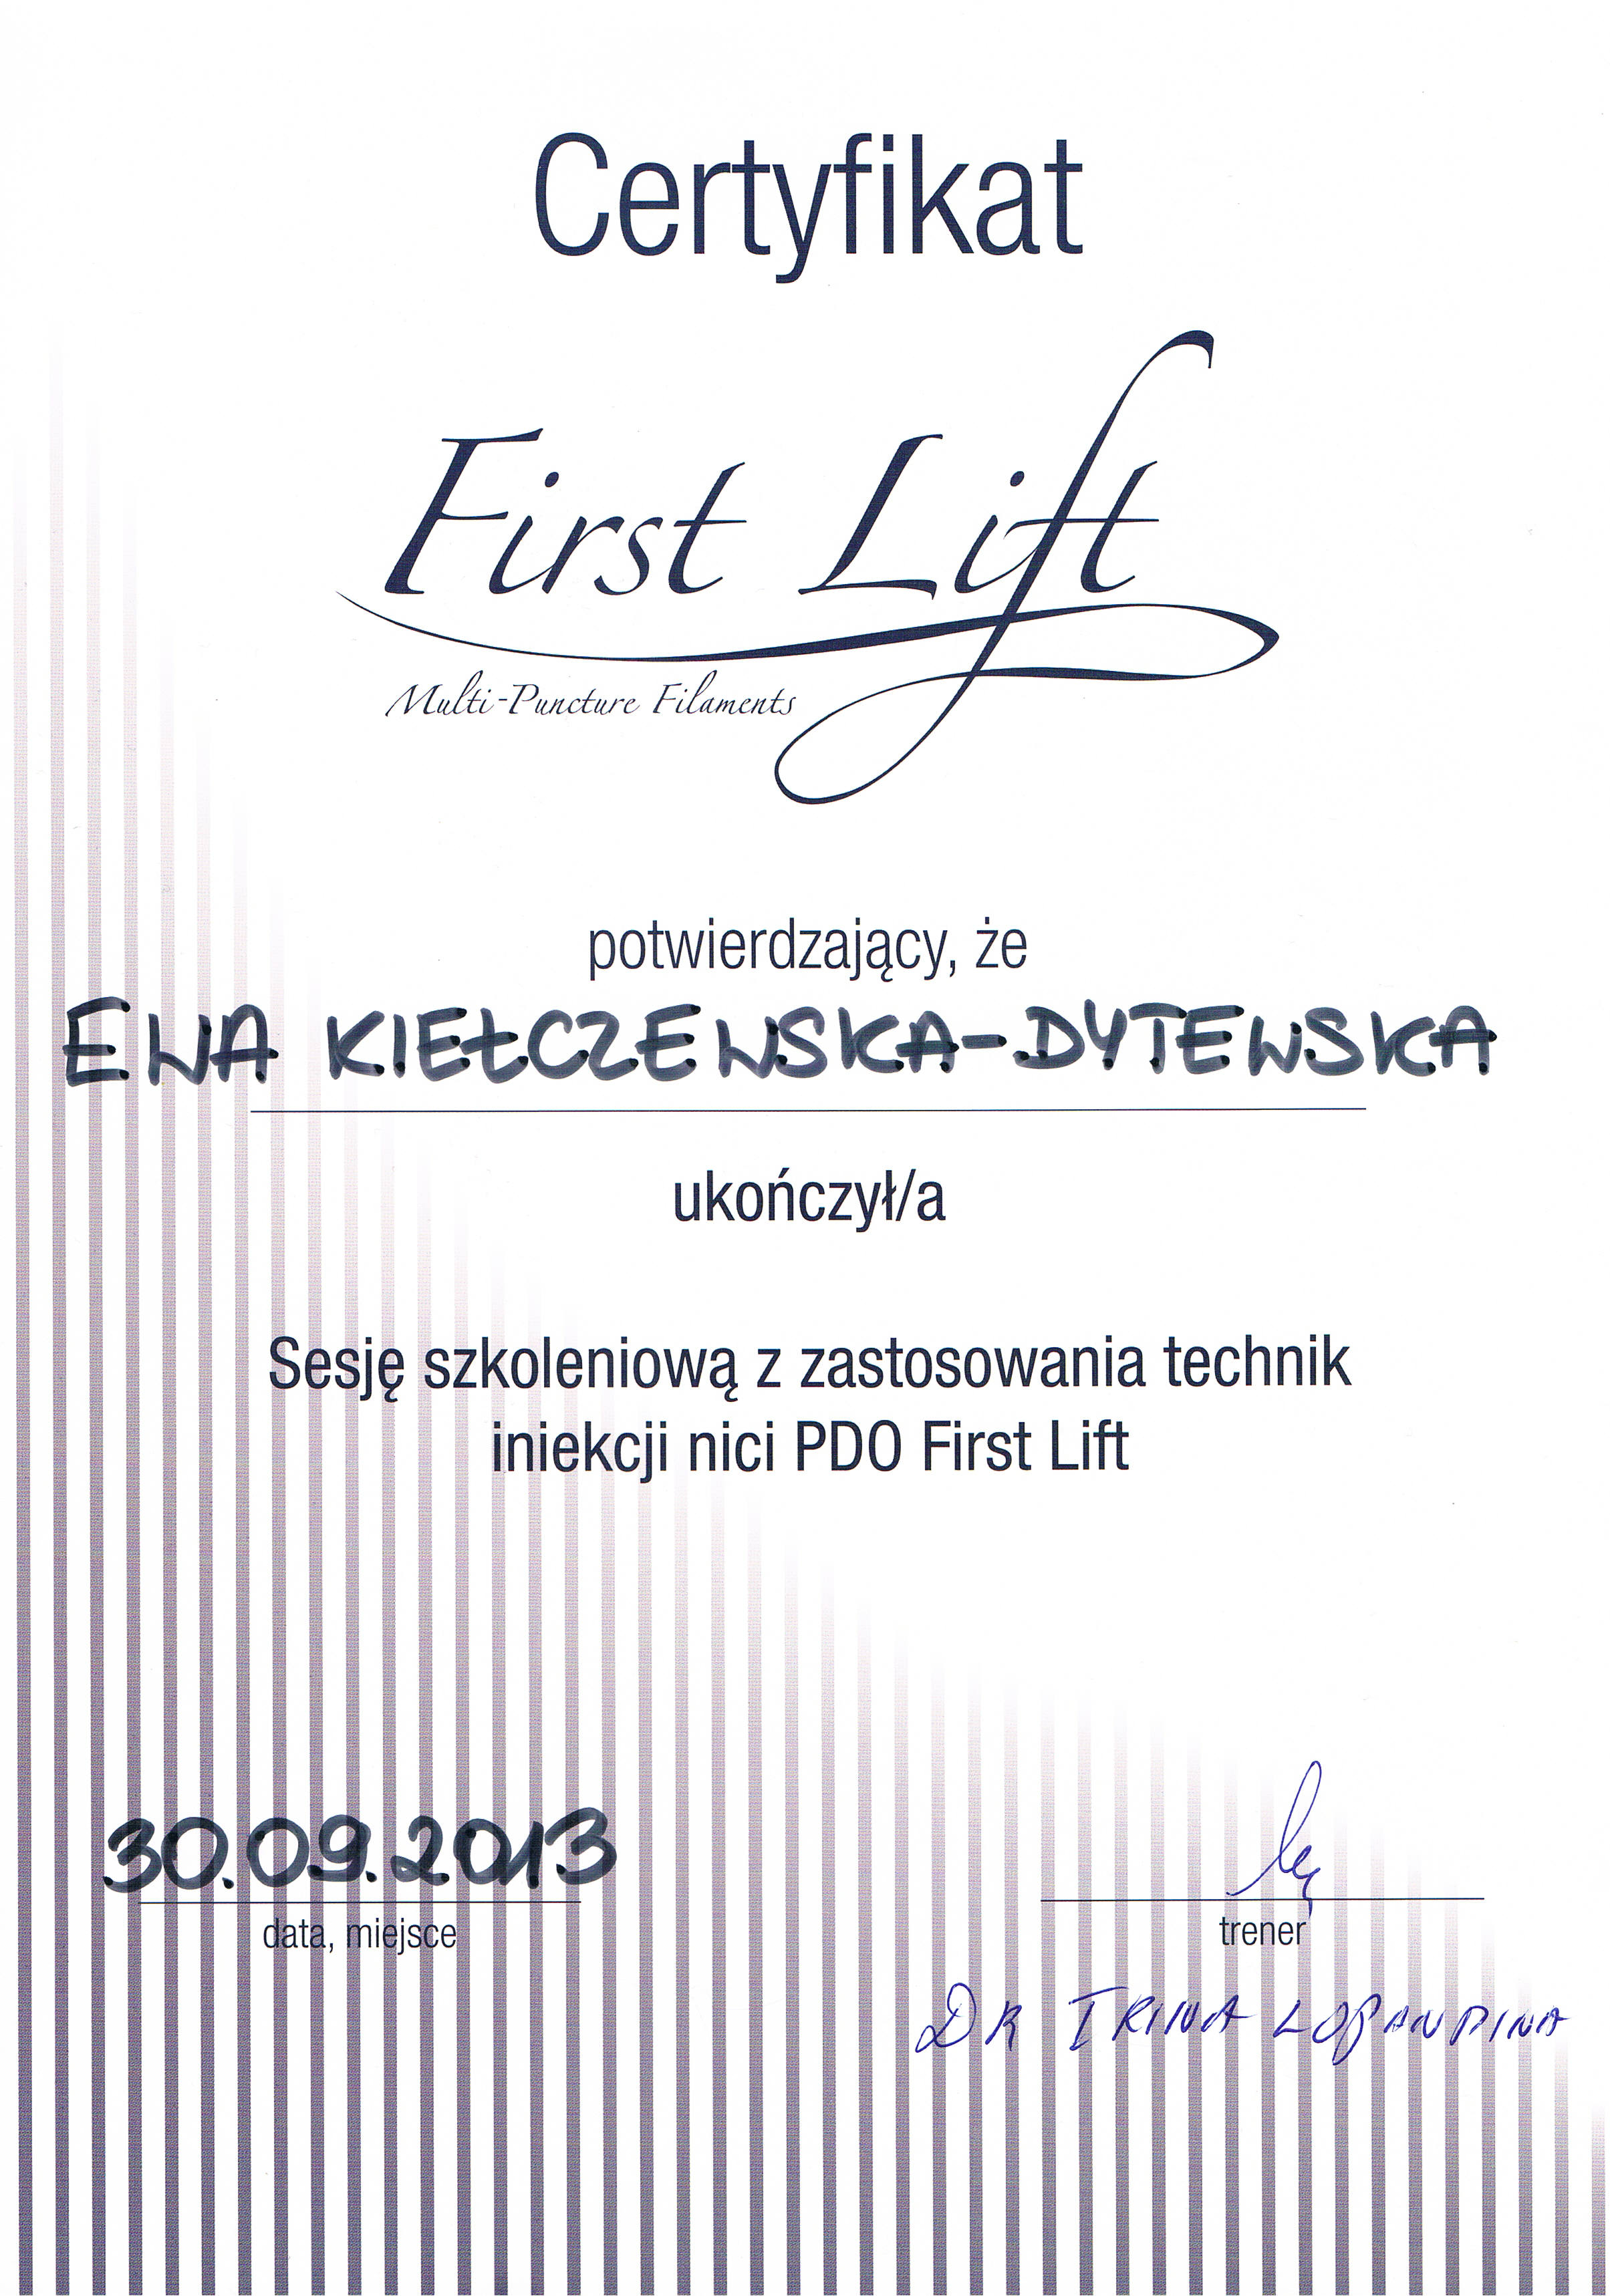 CCF20140118_00002